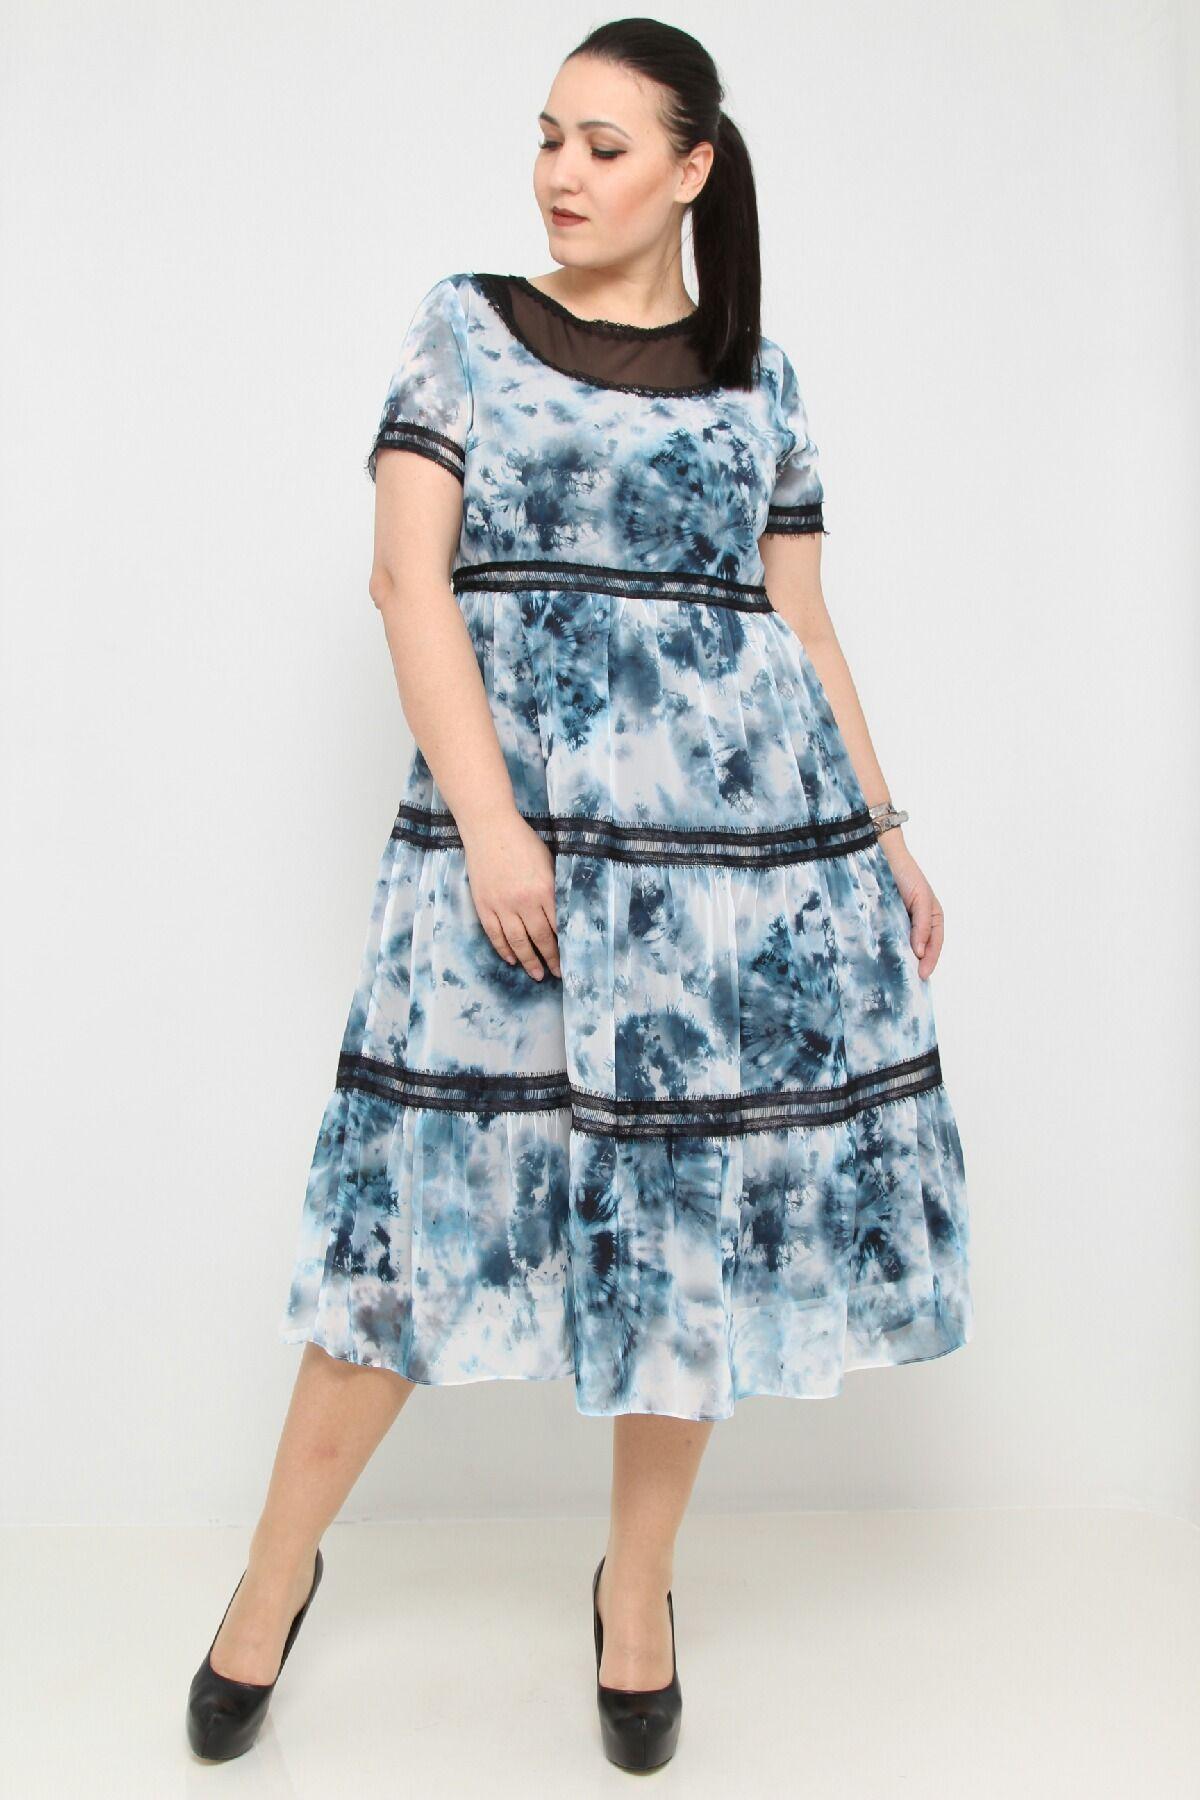 Day Dresses Medium-Petrol Blue